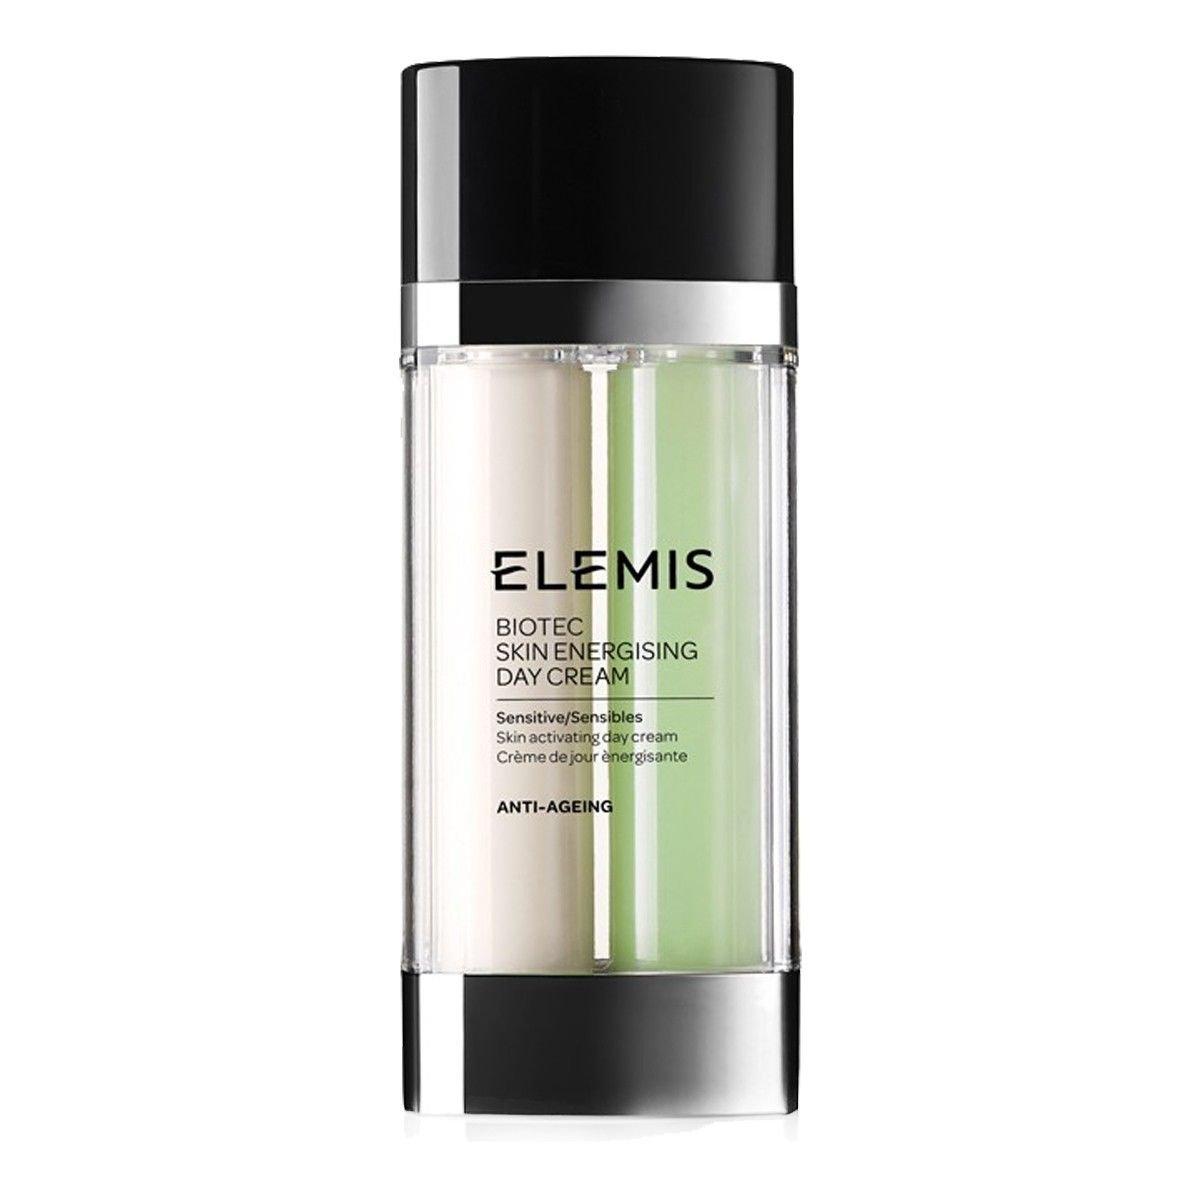 Afbeelding van Elemis BIOTEC Day Cream Sensitive 30Ml Beauty